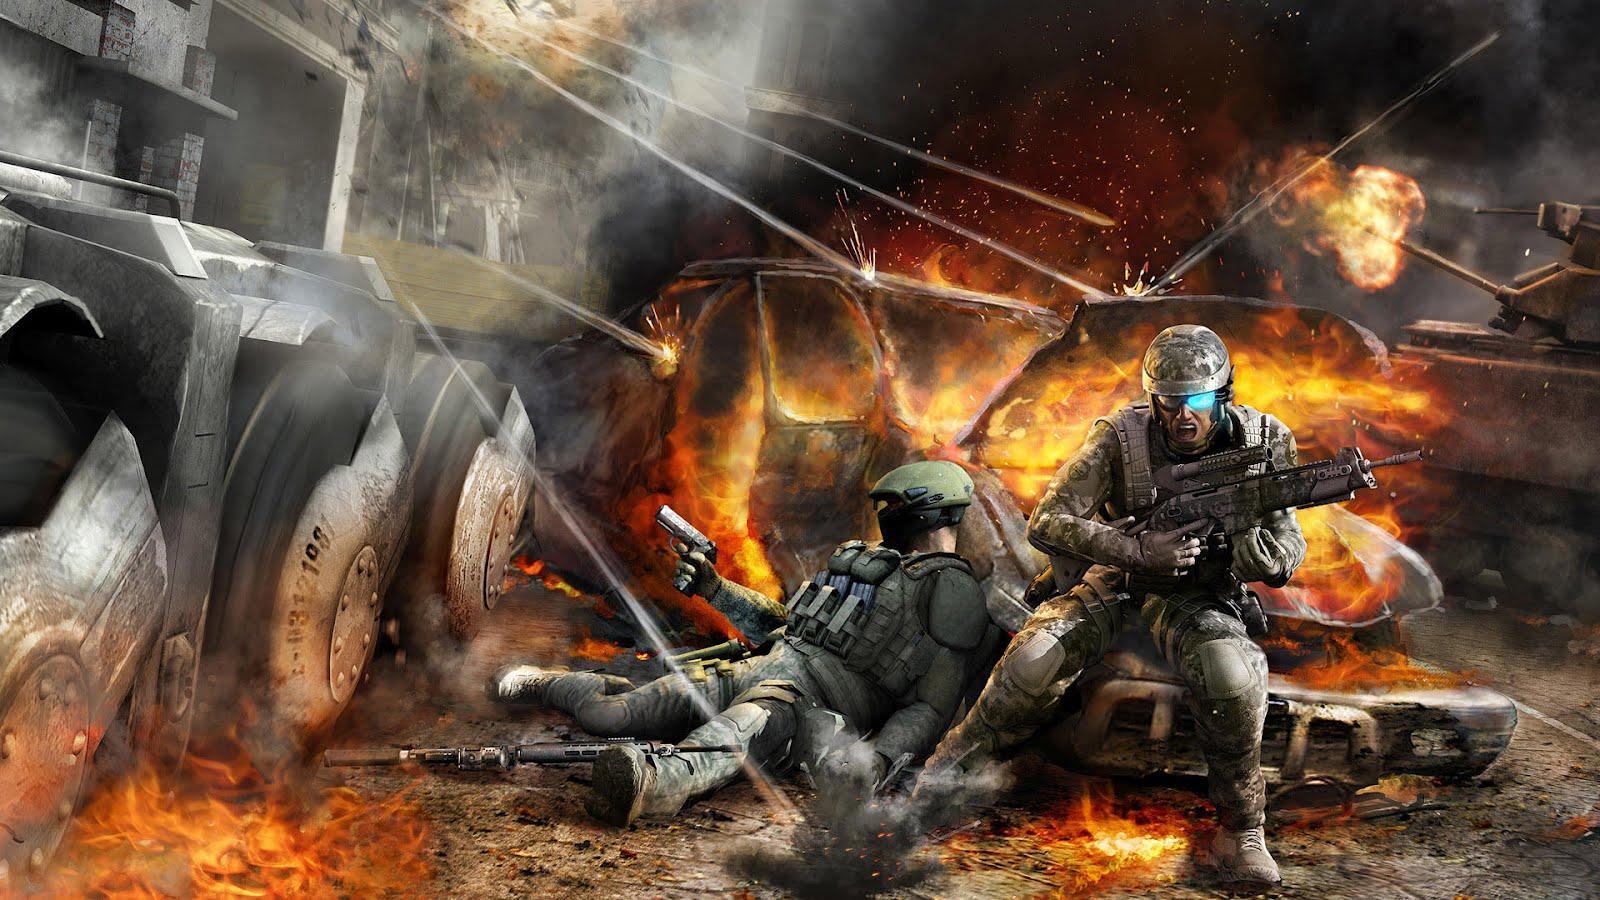 http://1.bp.blogspot.com/-LX0vH_7gWho/UAAbbu4w61I/AAAAAAAAB0I/bhZOANo6e1E/s1600/ghost-recon-future-soldier_hd%2Bgamescay.jpg